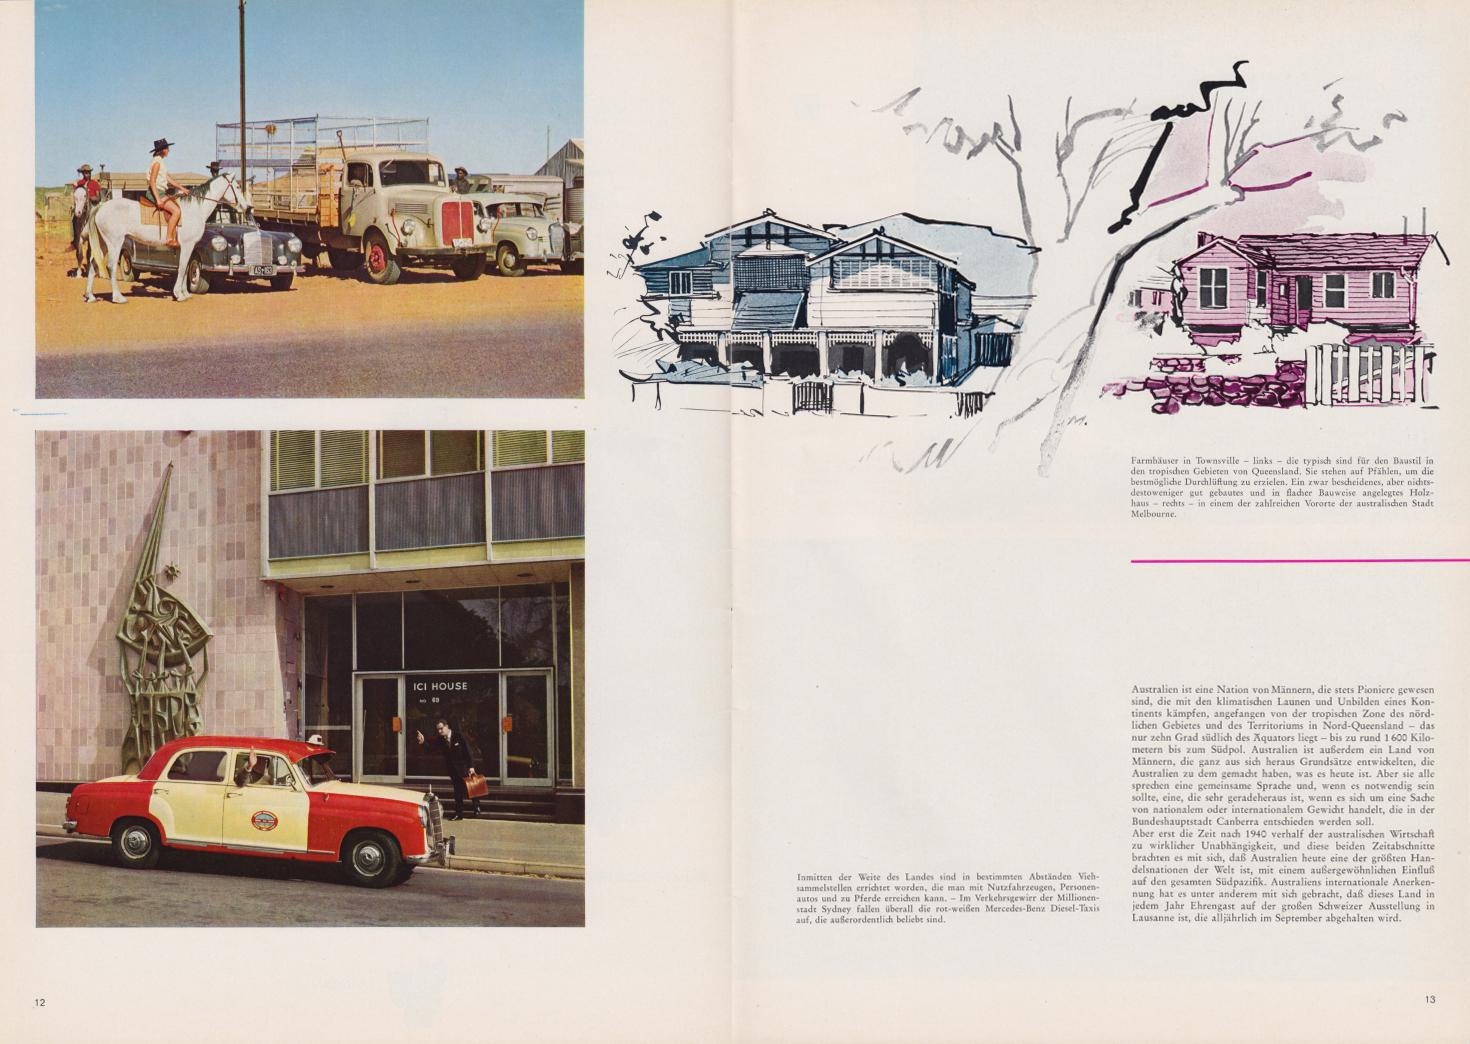 (REVISTA): Periódico In aller welt n.º 44 - Mercedes-Benz no mundo - 1960 - multilingue 007